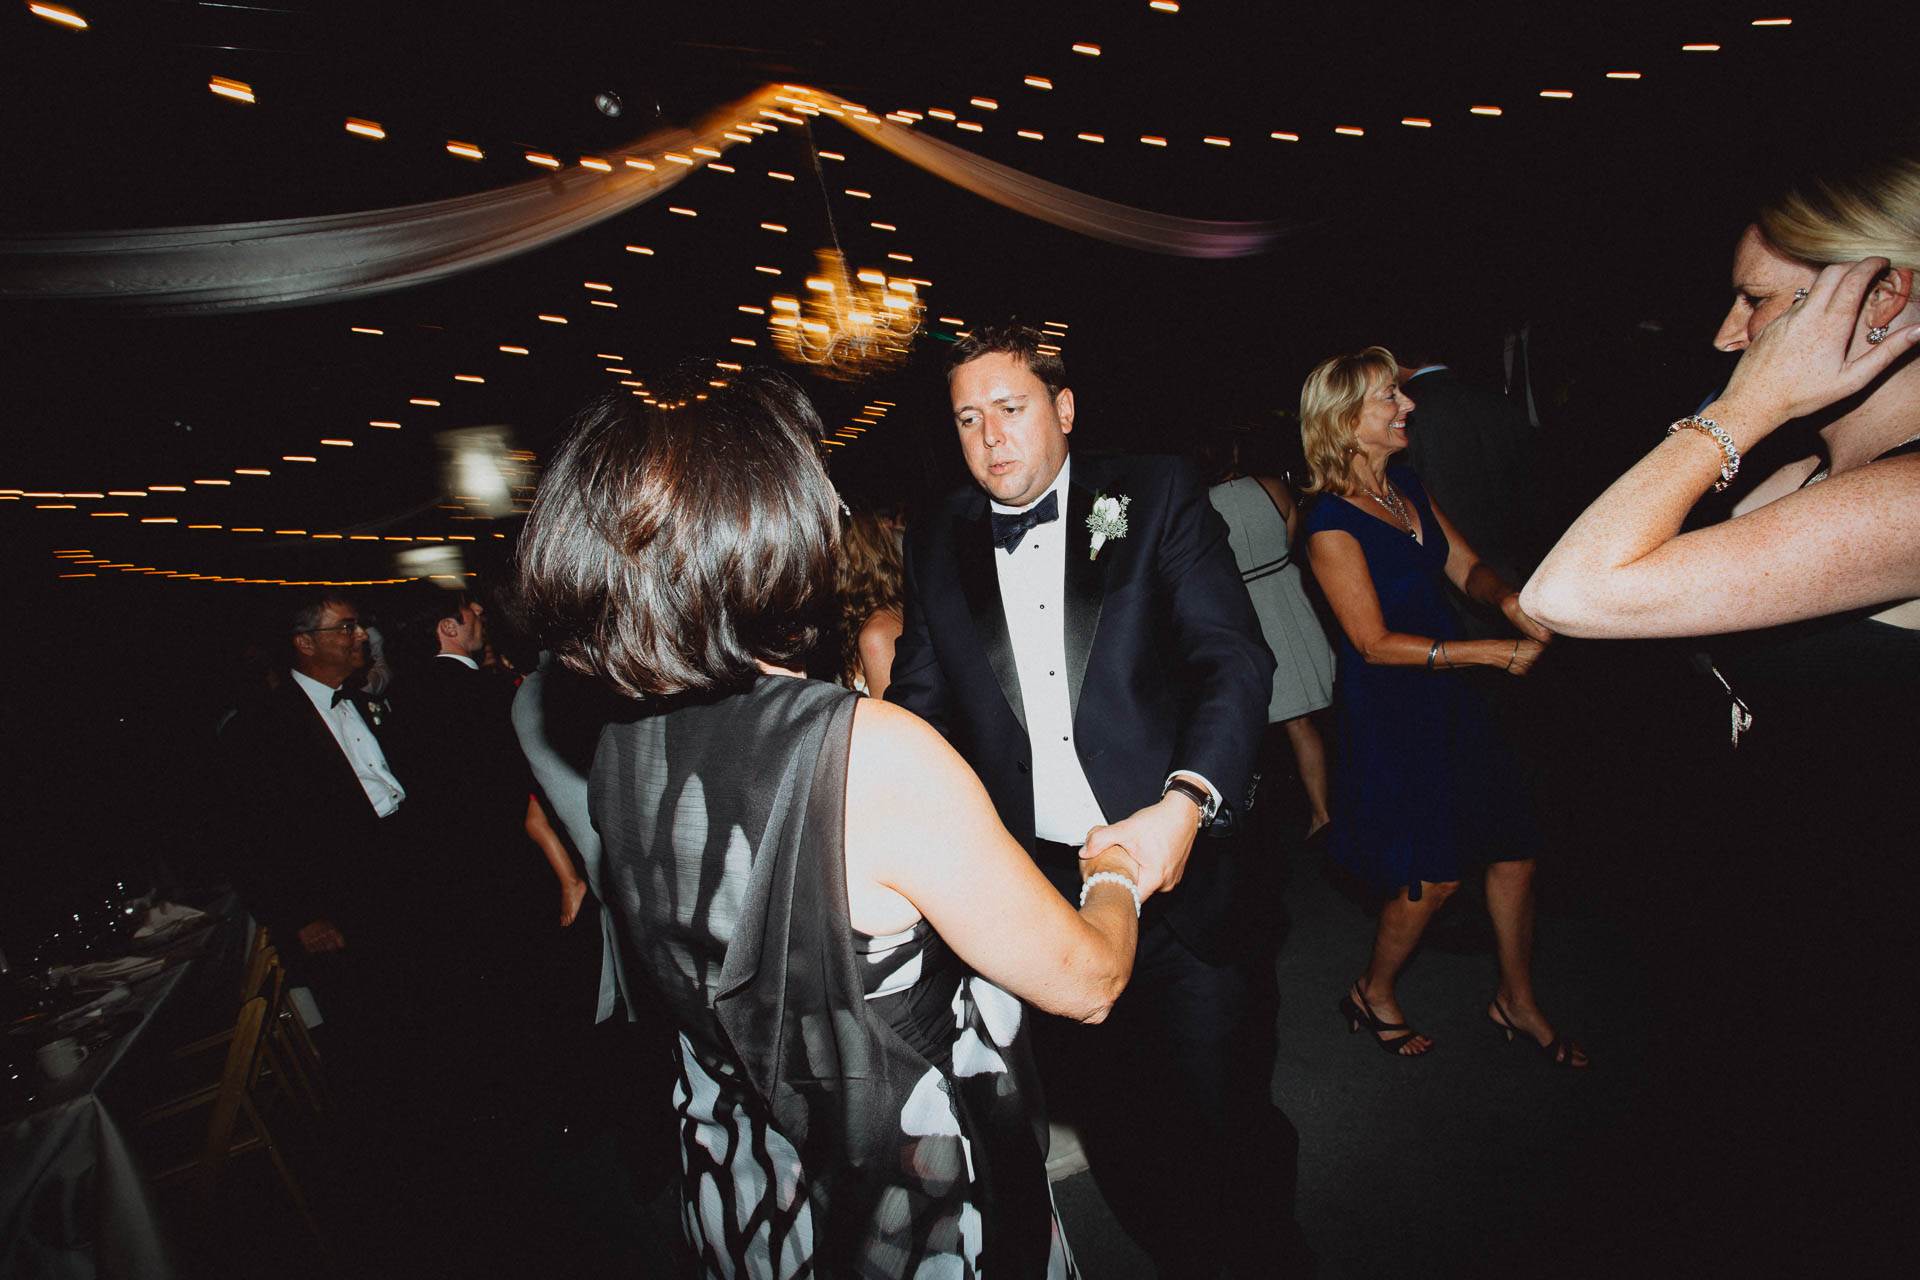 Keri-Joseph-Top-of-the-Market-Wedding-200@2x.jpg